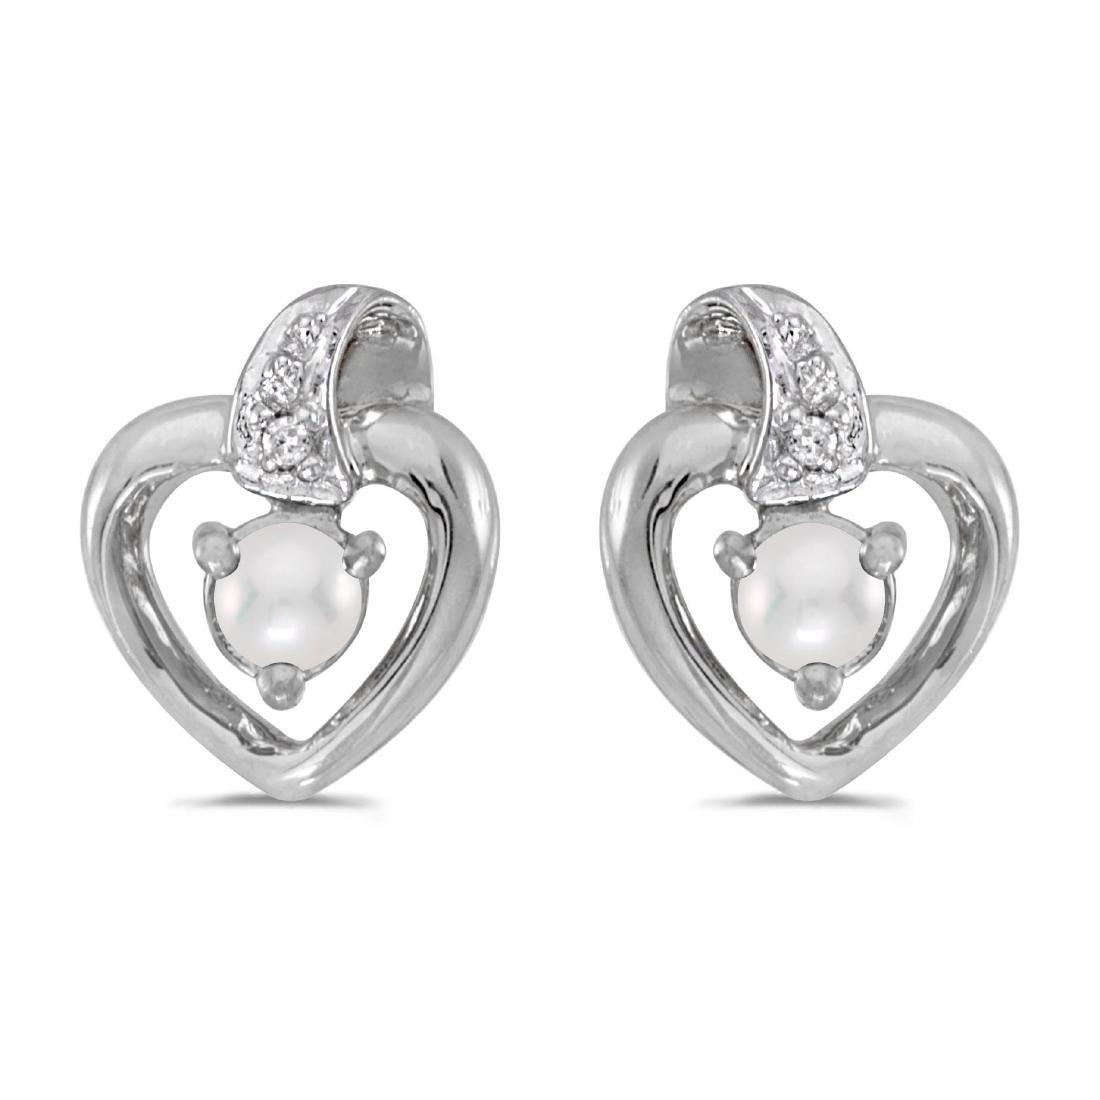 Certified 14k White Gold Pearl And Diamond Heart Earrin